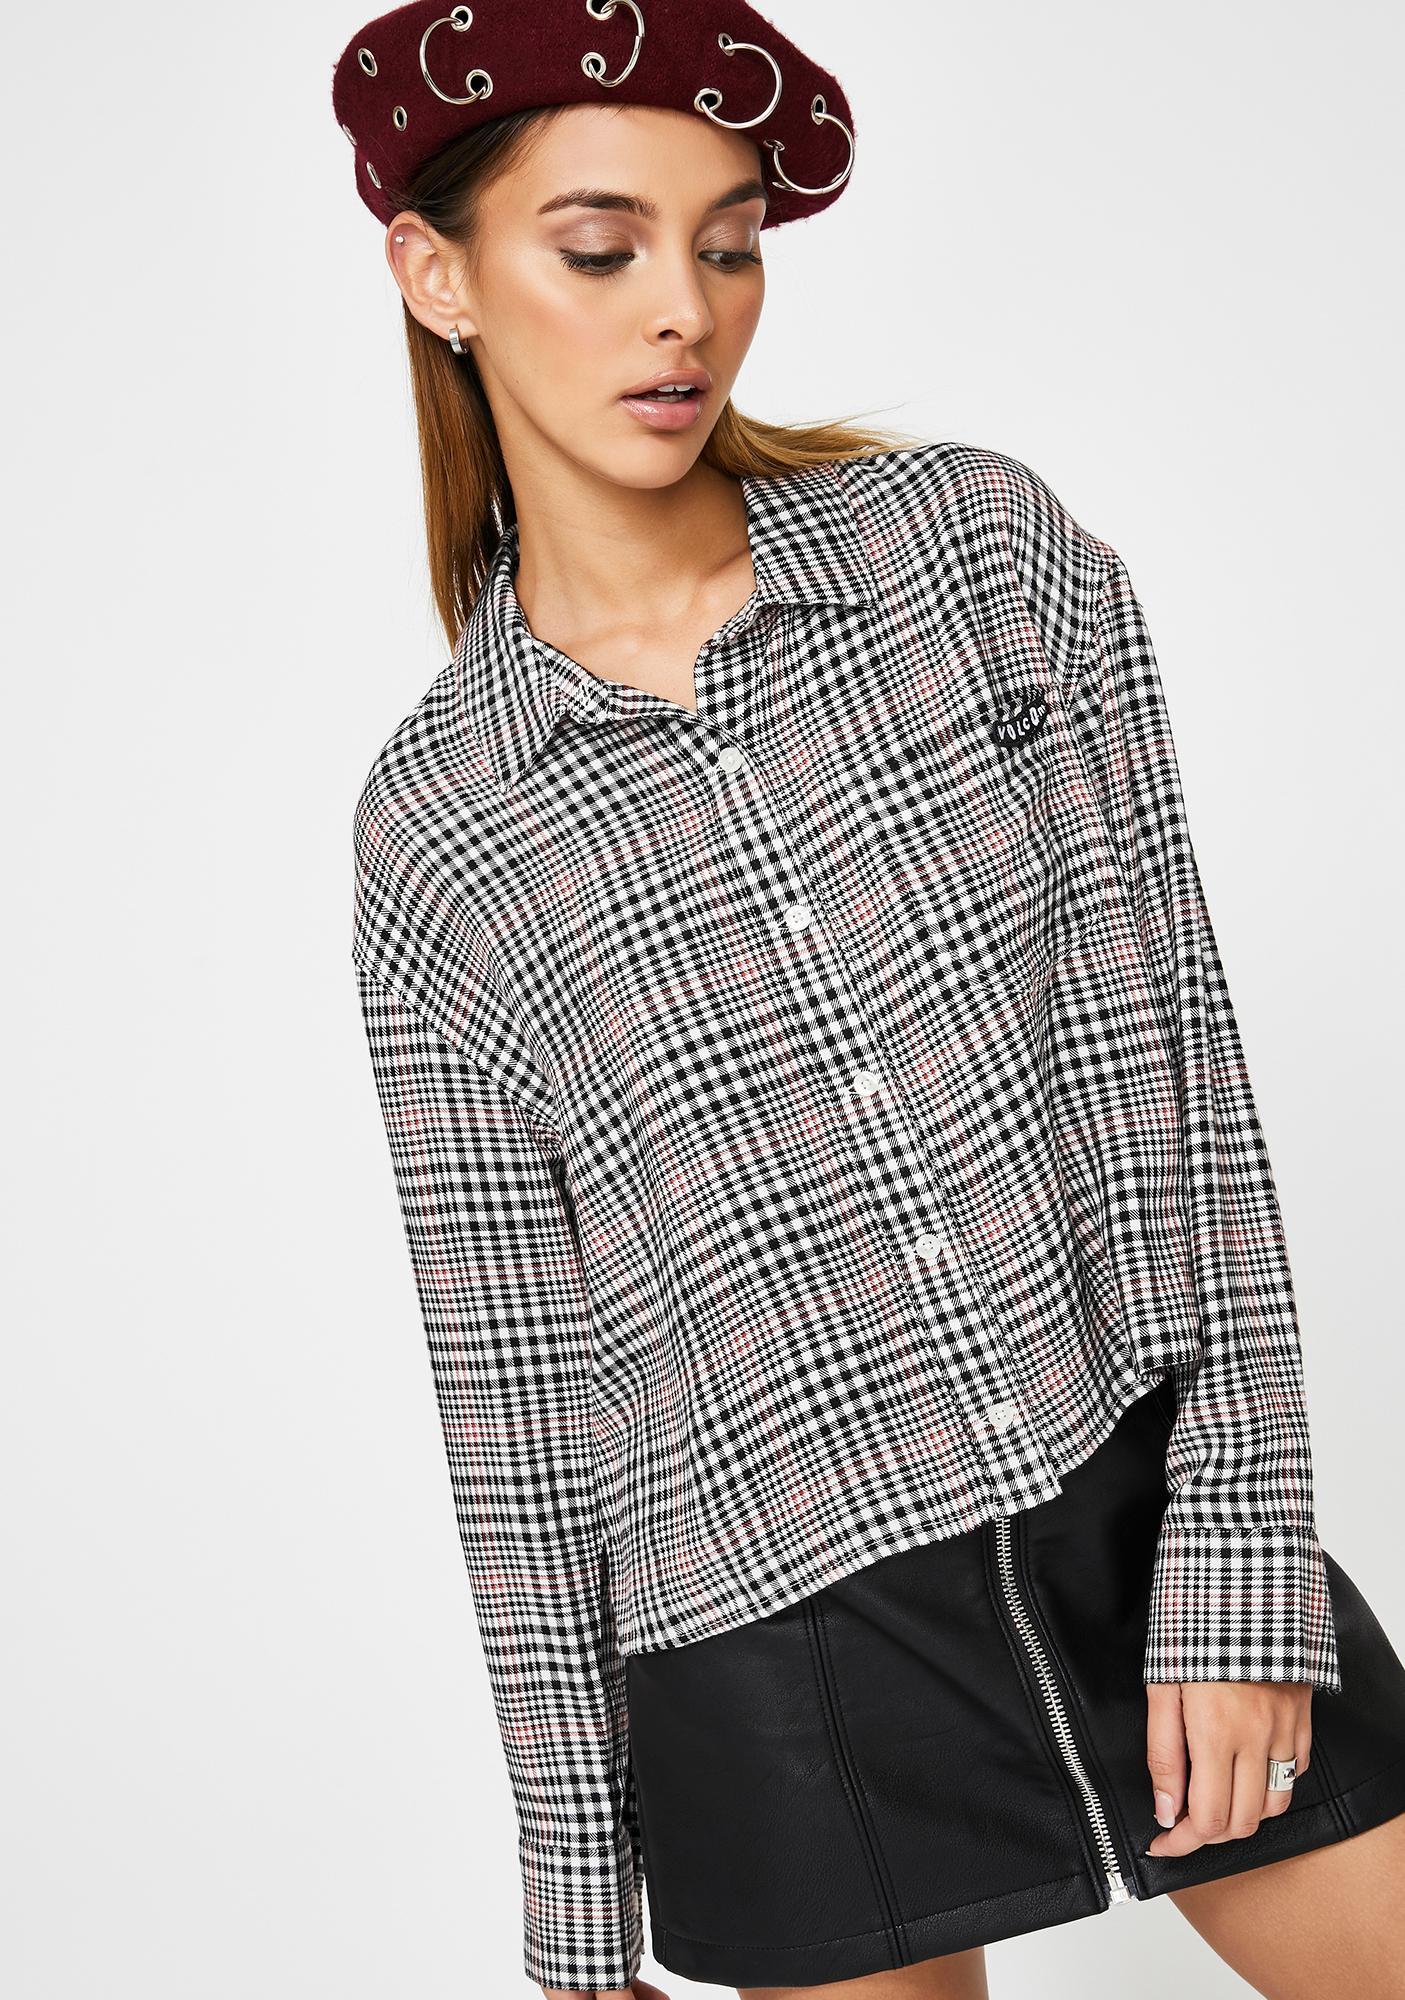 Volcom Fad Friend Long Sleeve Shirt